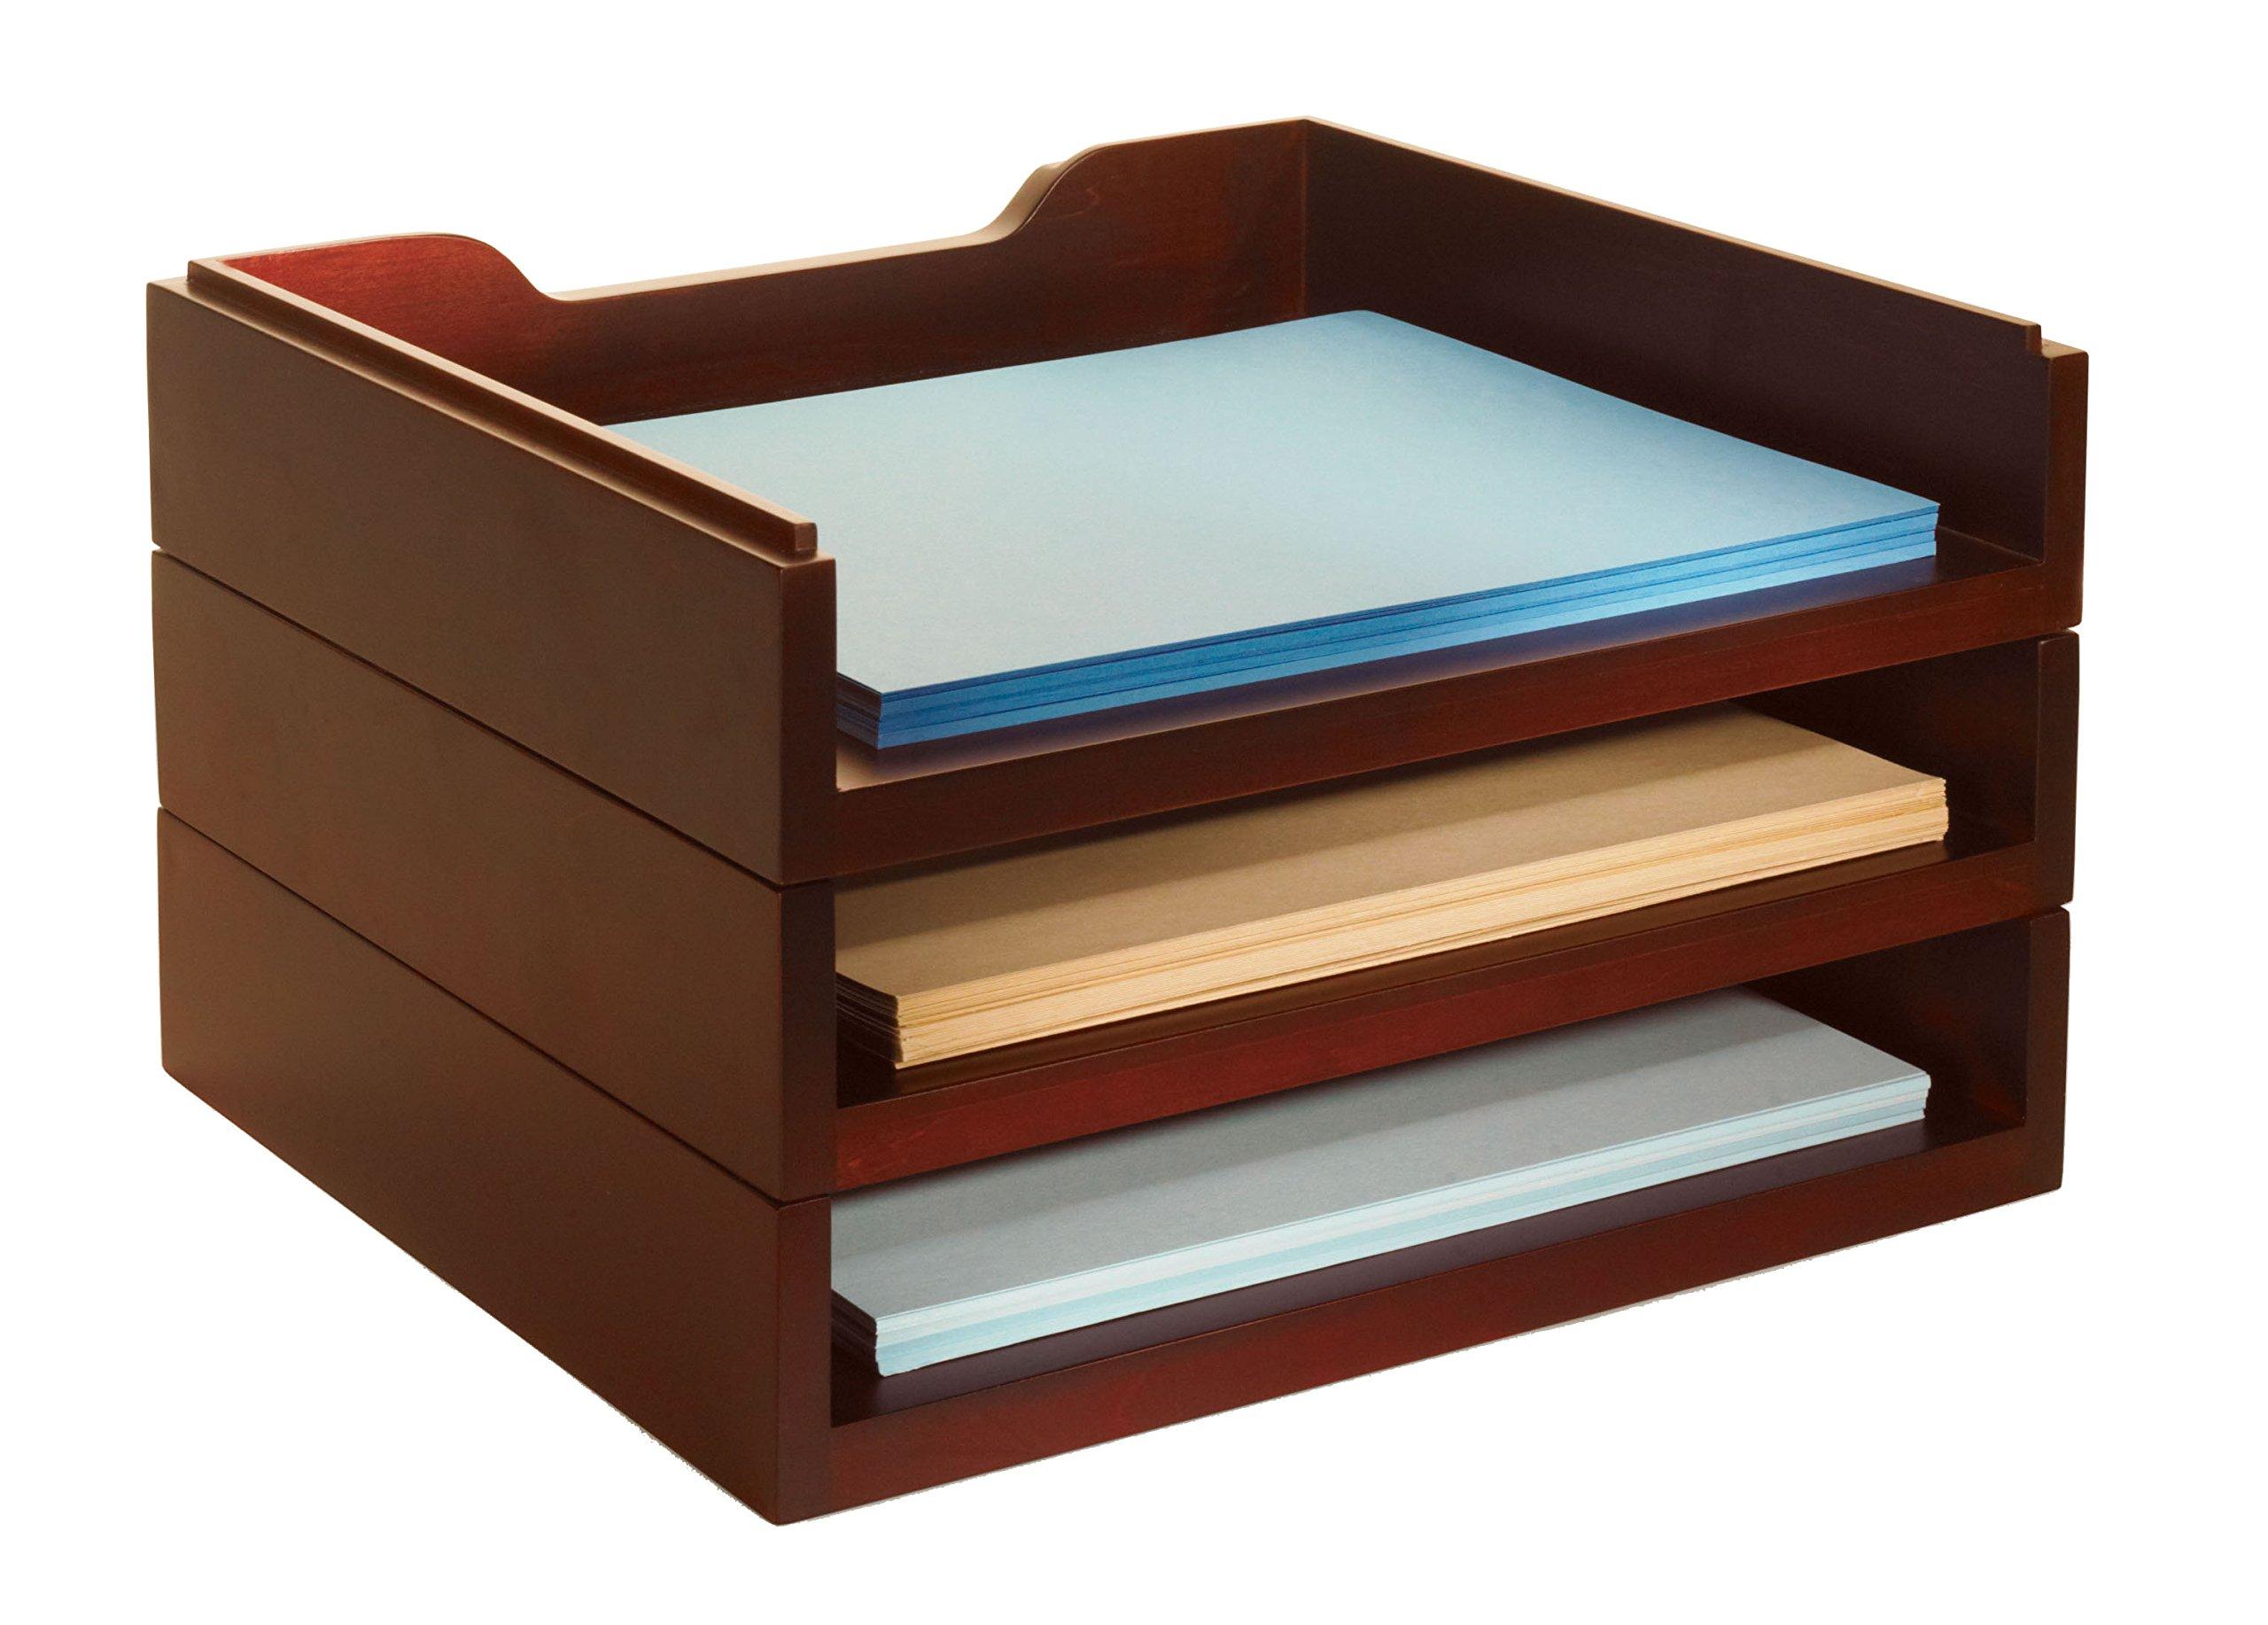 Bindertek Stacking Wood Desk Organizers with 3 Letter Tray Kit, Mahogany (WK4-MA) by Bindertek